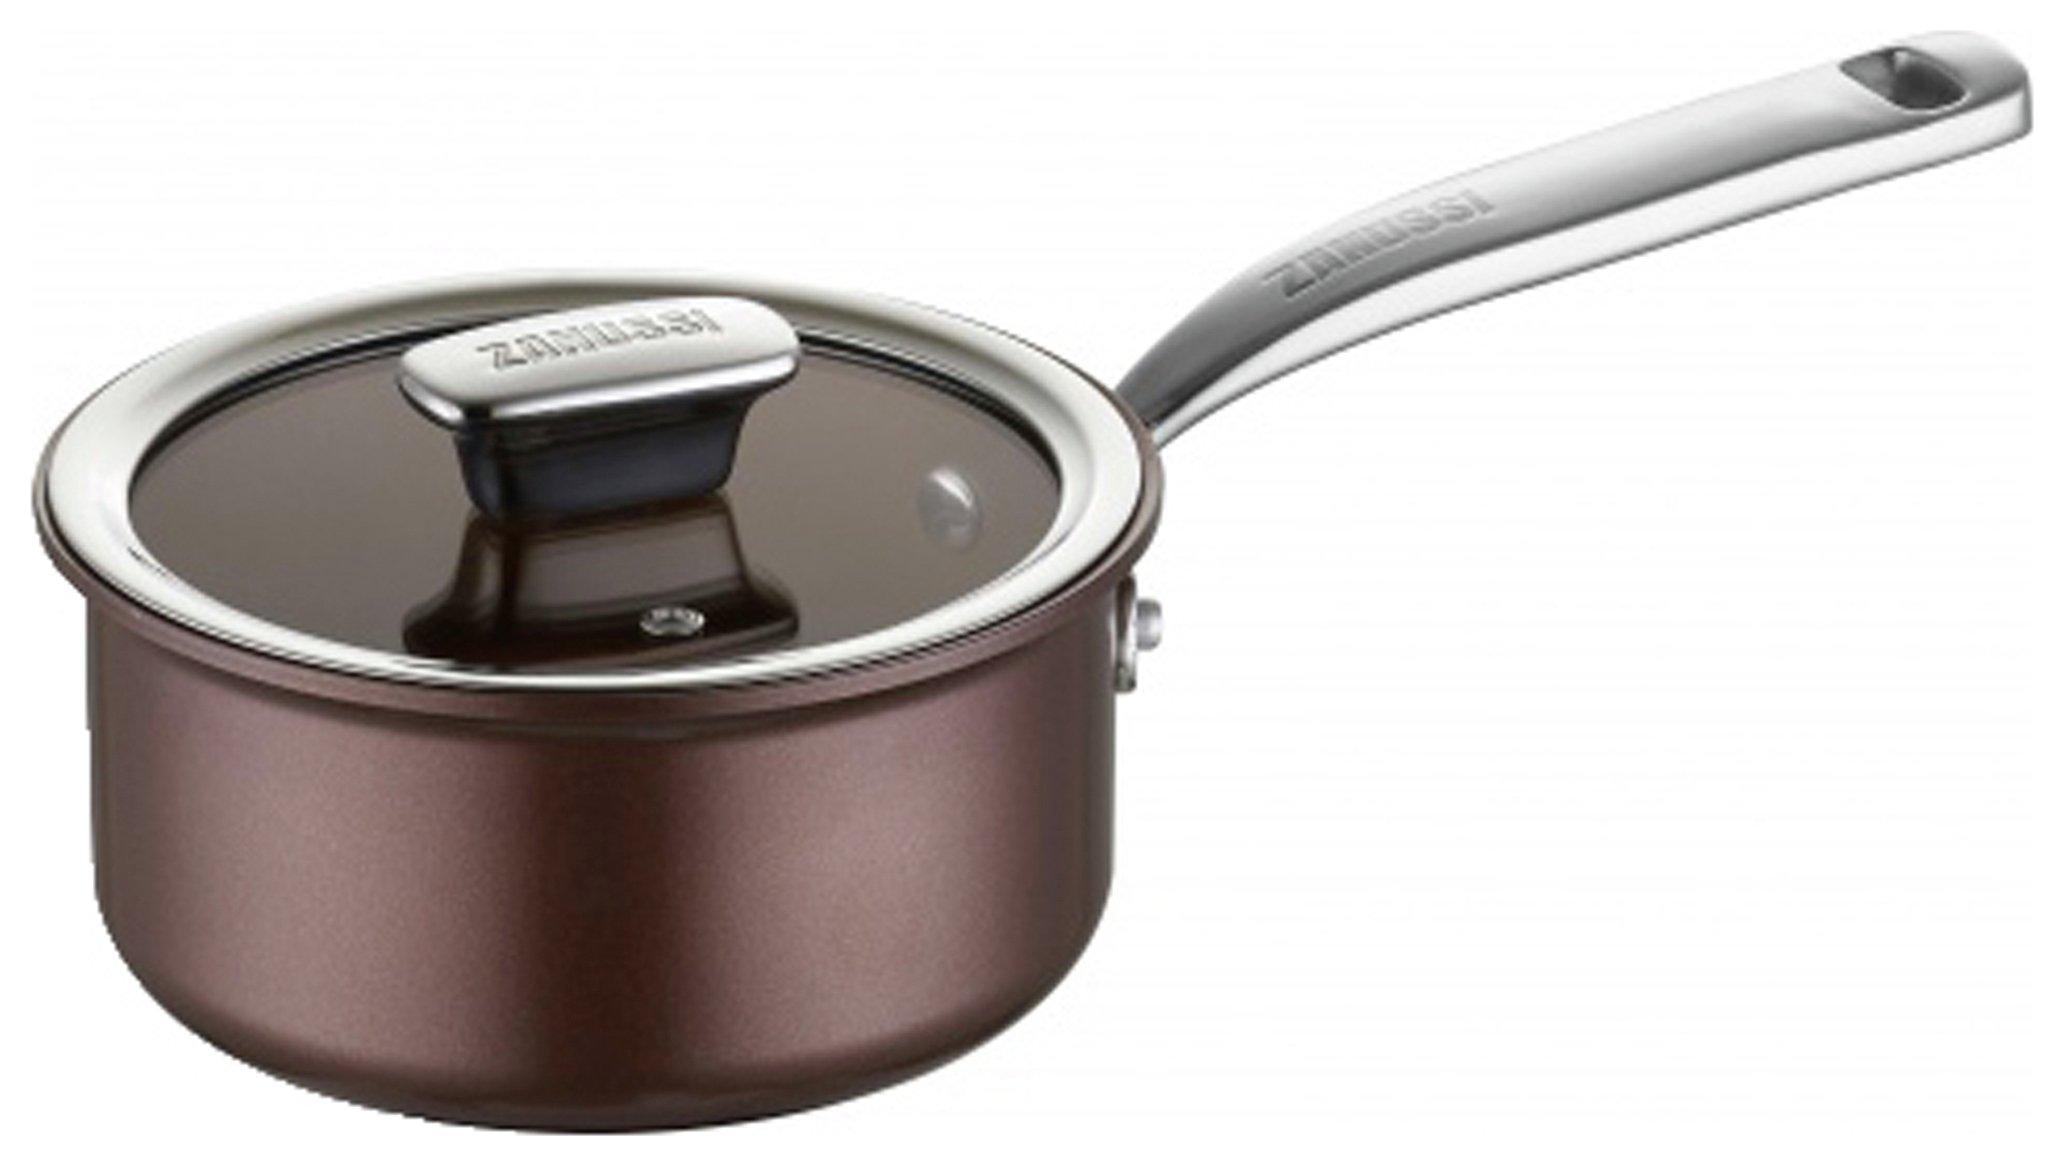 Zanussi Siena 20cm Aluminium Saucepan with Lid